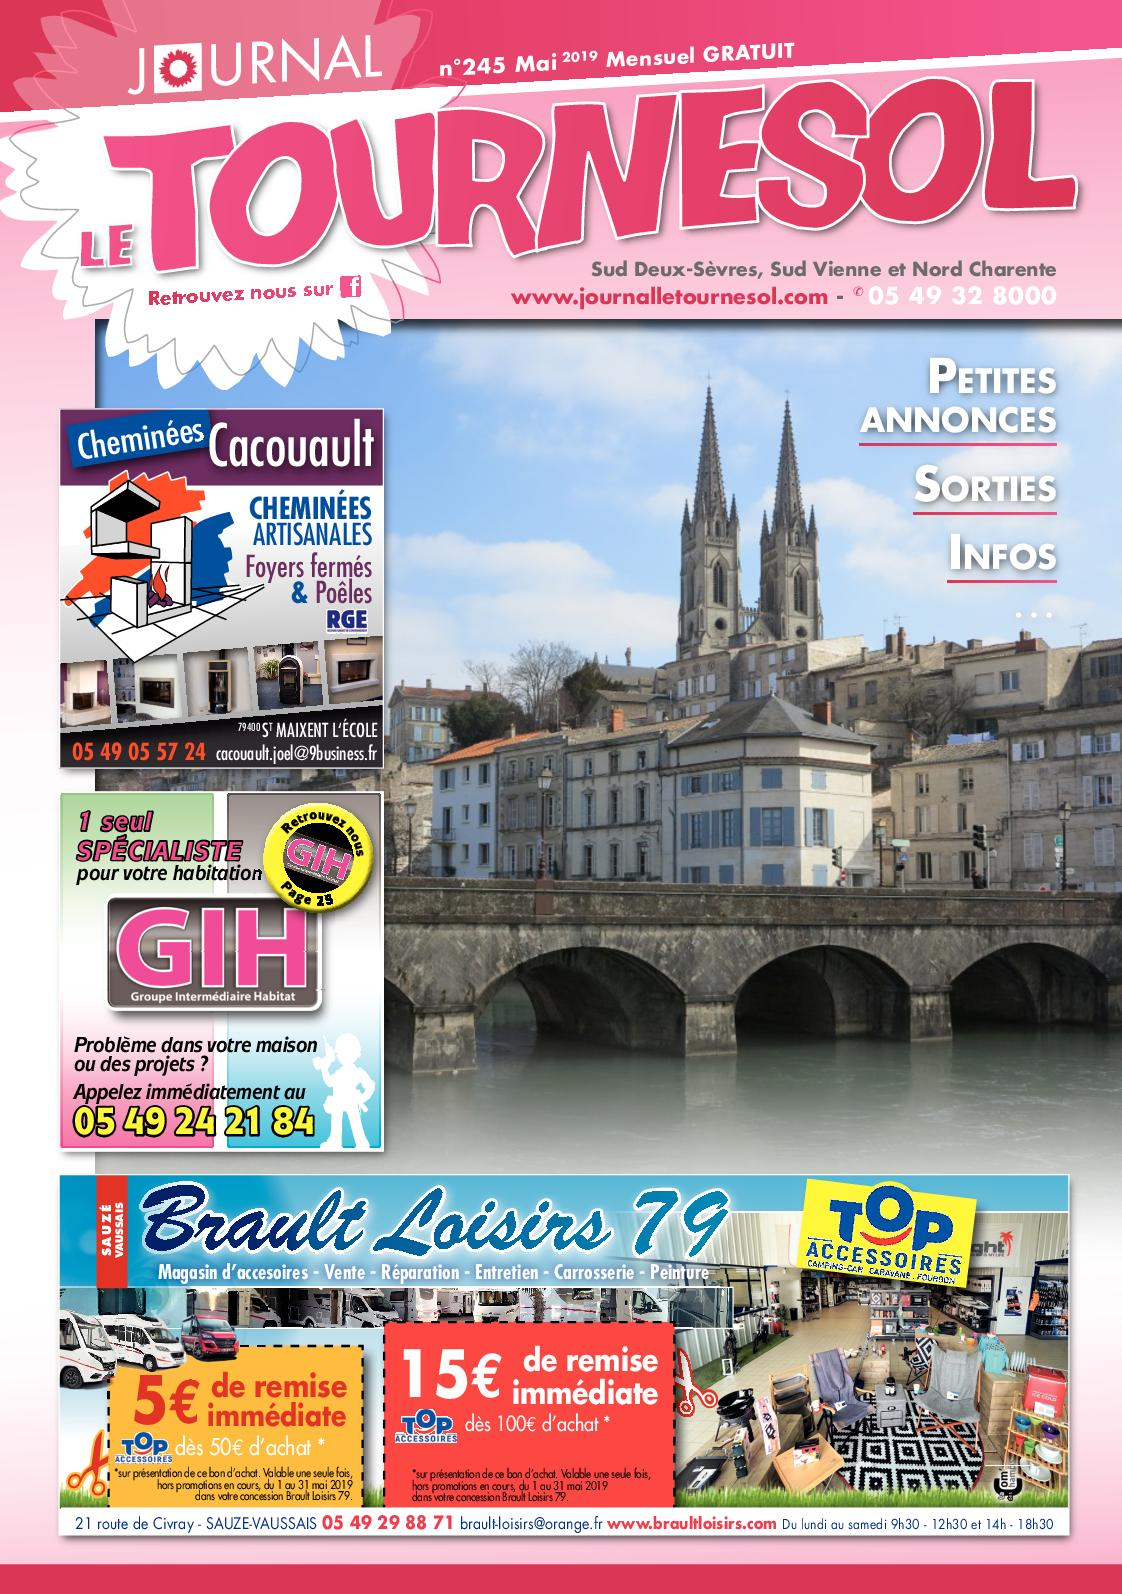 Tapis Pour Caravane Gitan calaméo - journal le tournesol mai 2019